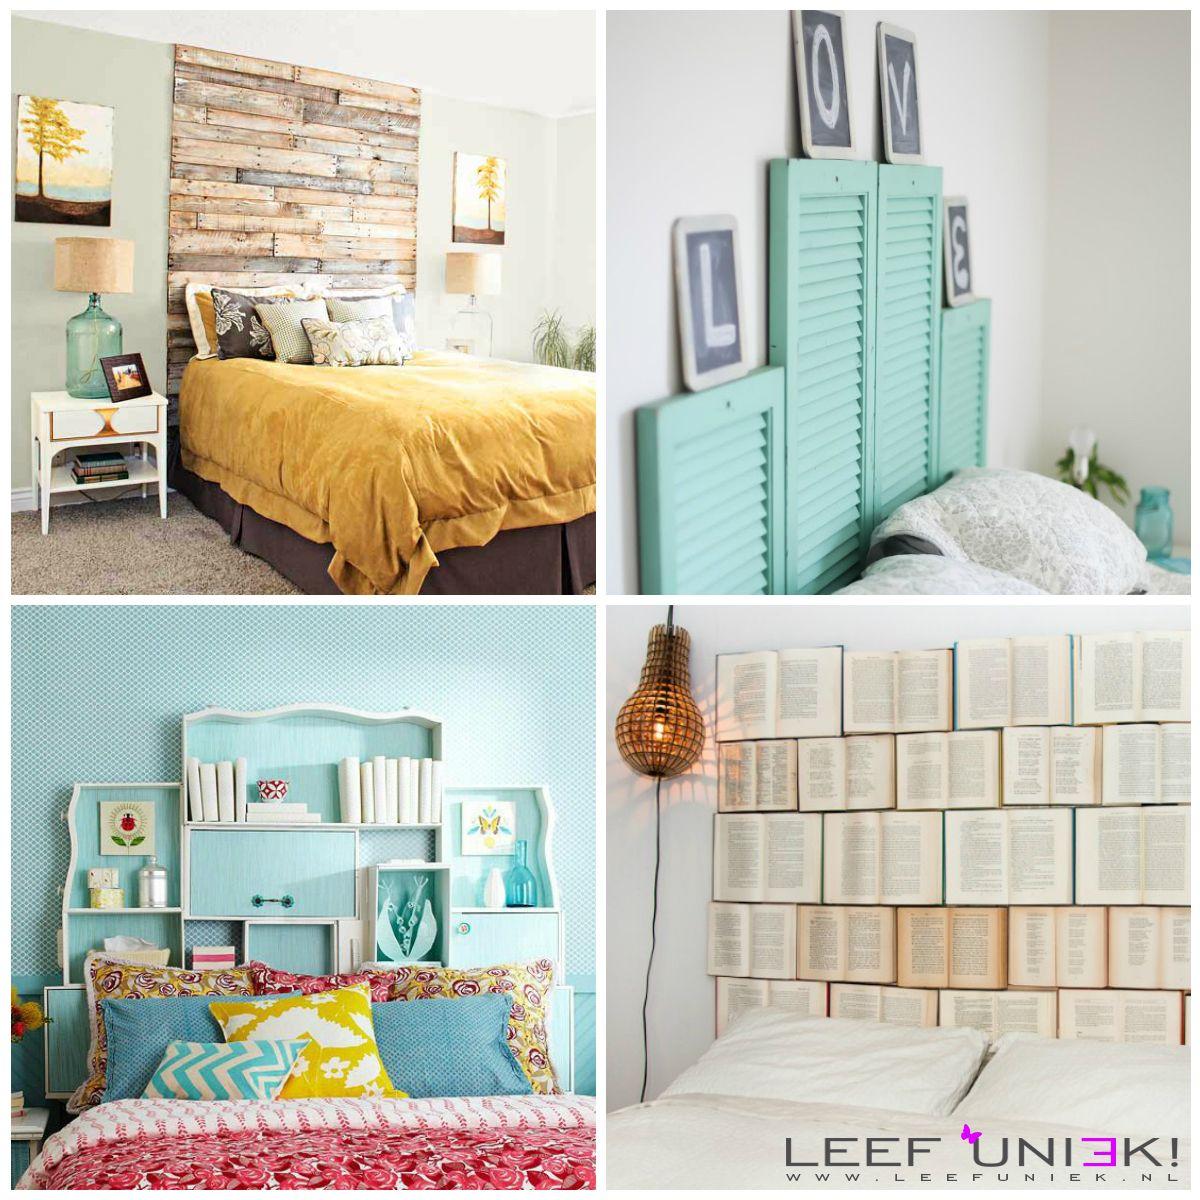 Leef Uniek | DIY | Slaapkamer *Super leuke DIY tips om je slaapkamer ...